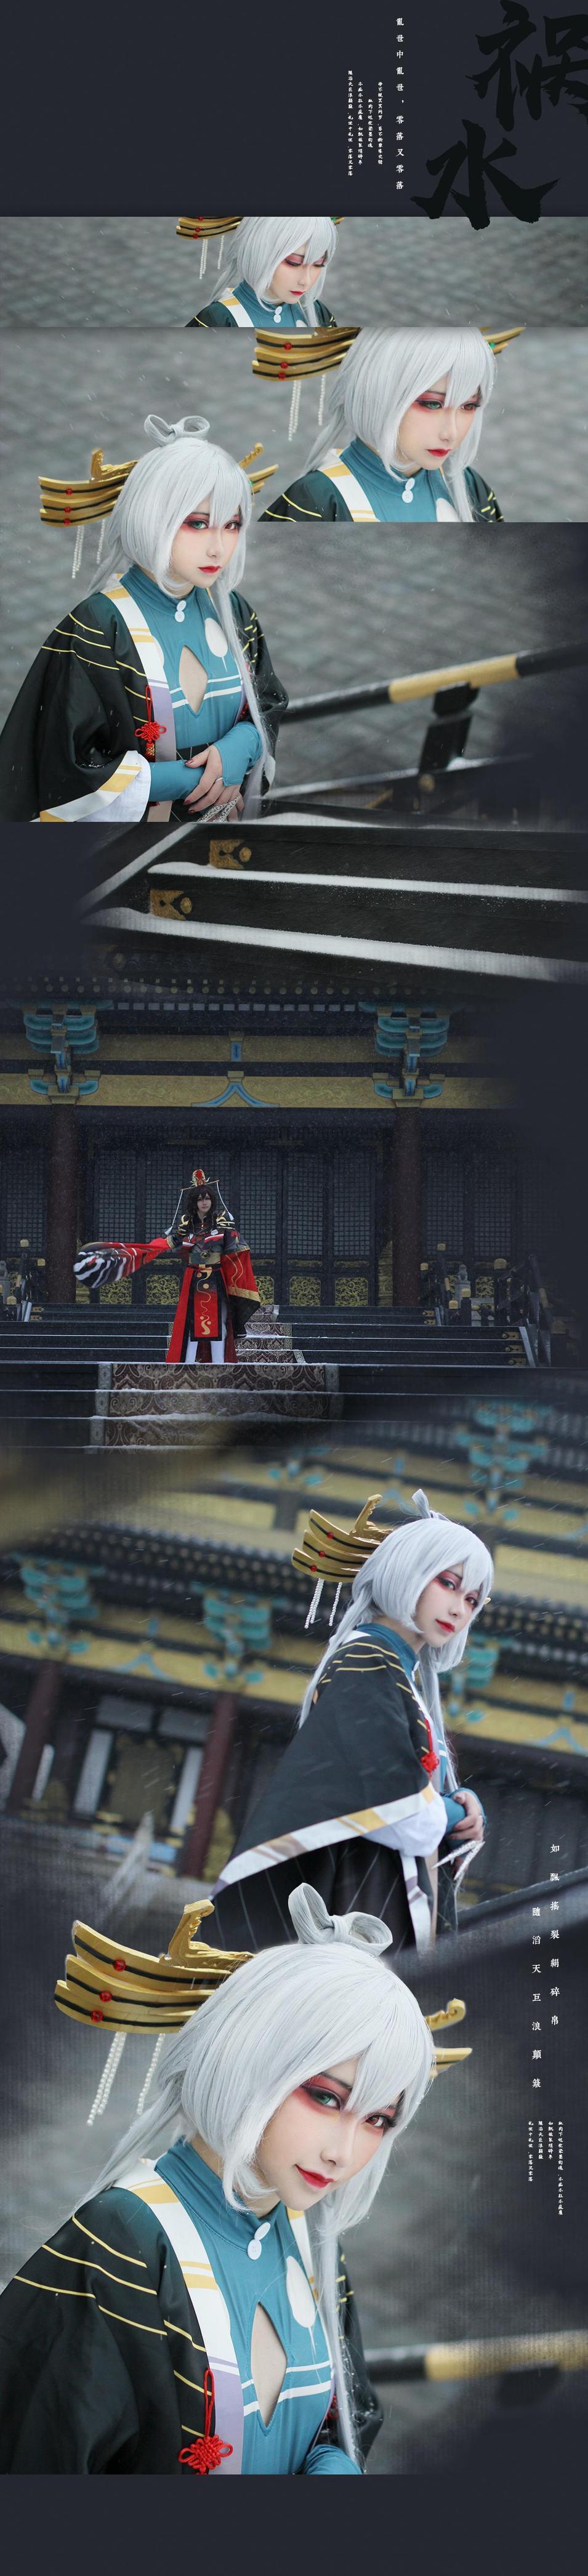 《VOCALOID》正片cosplay【CN:时雨-Jiu】-第6张